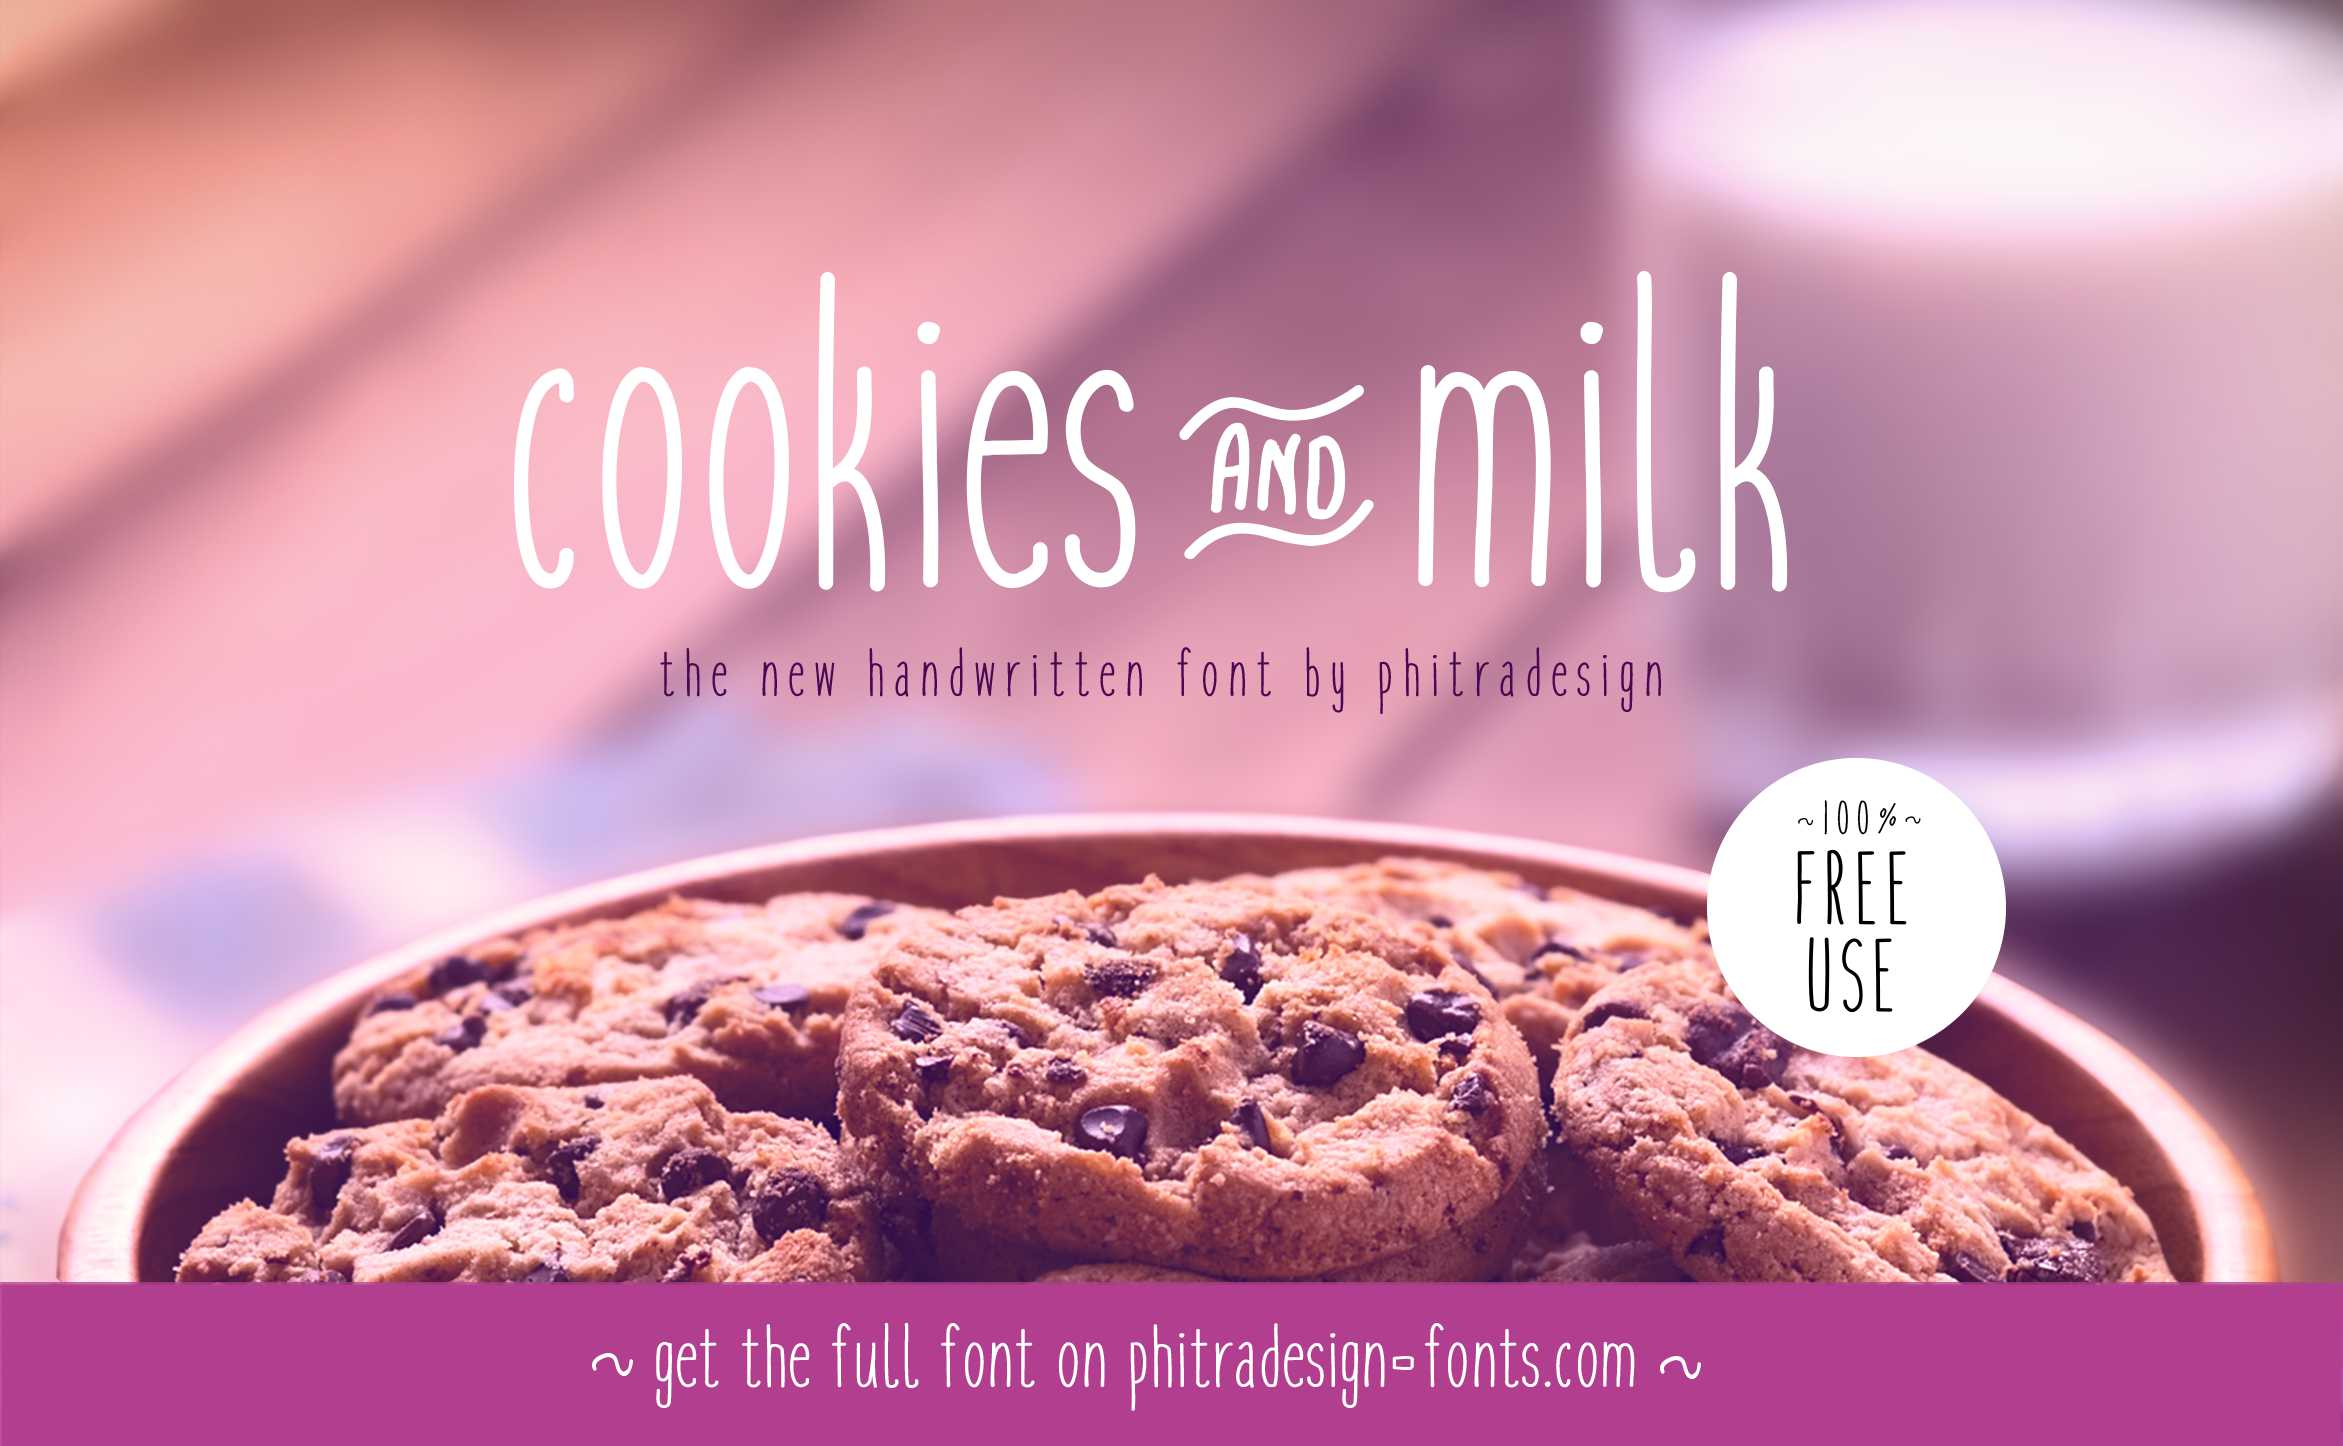 cookies_and_milk_promo